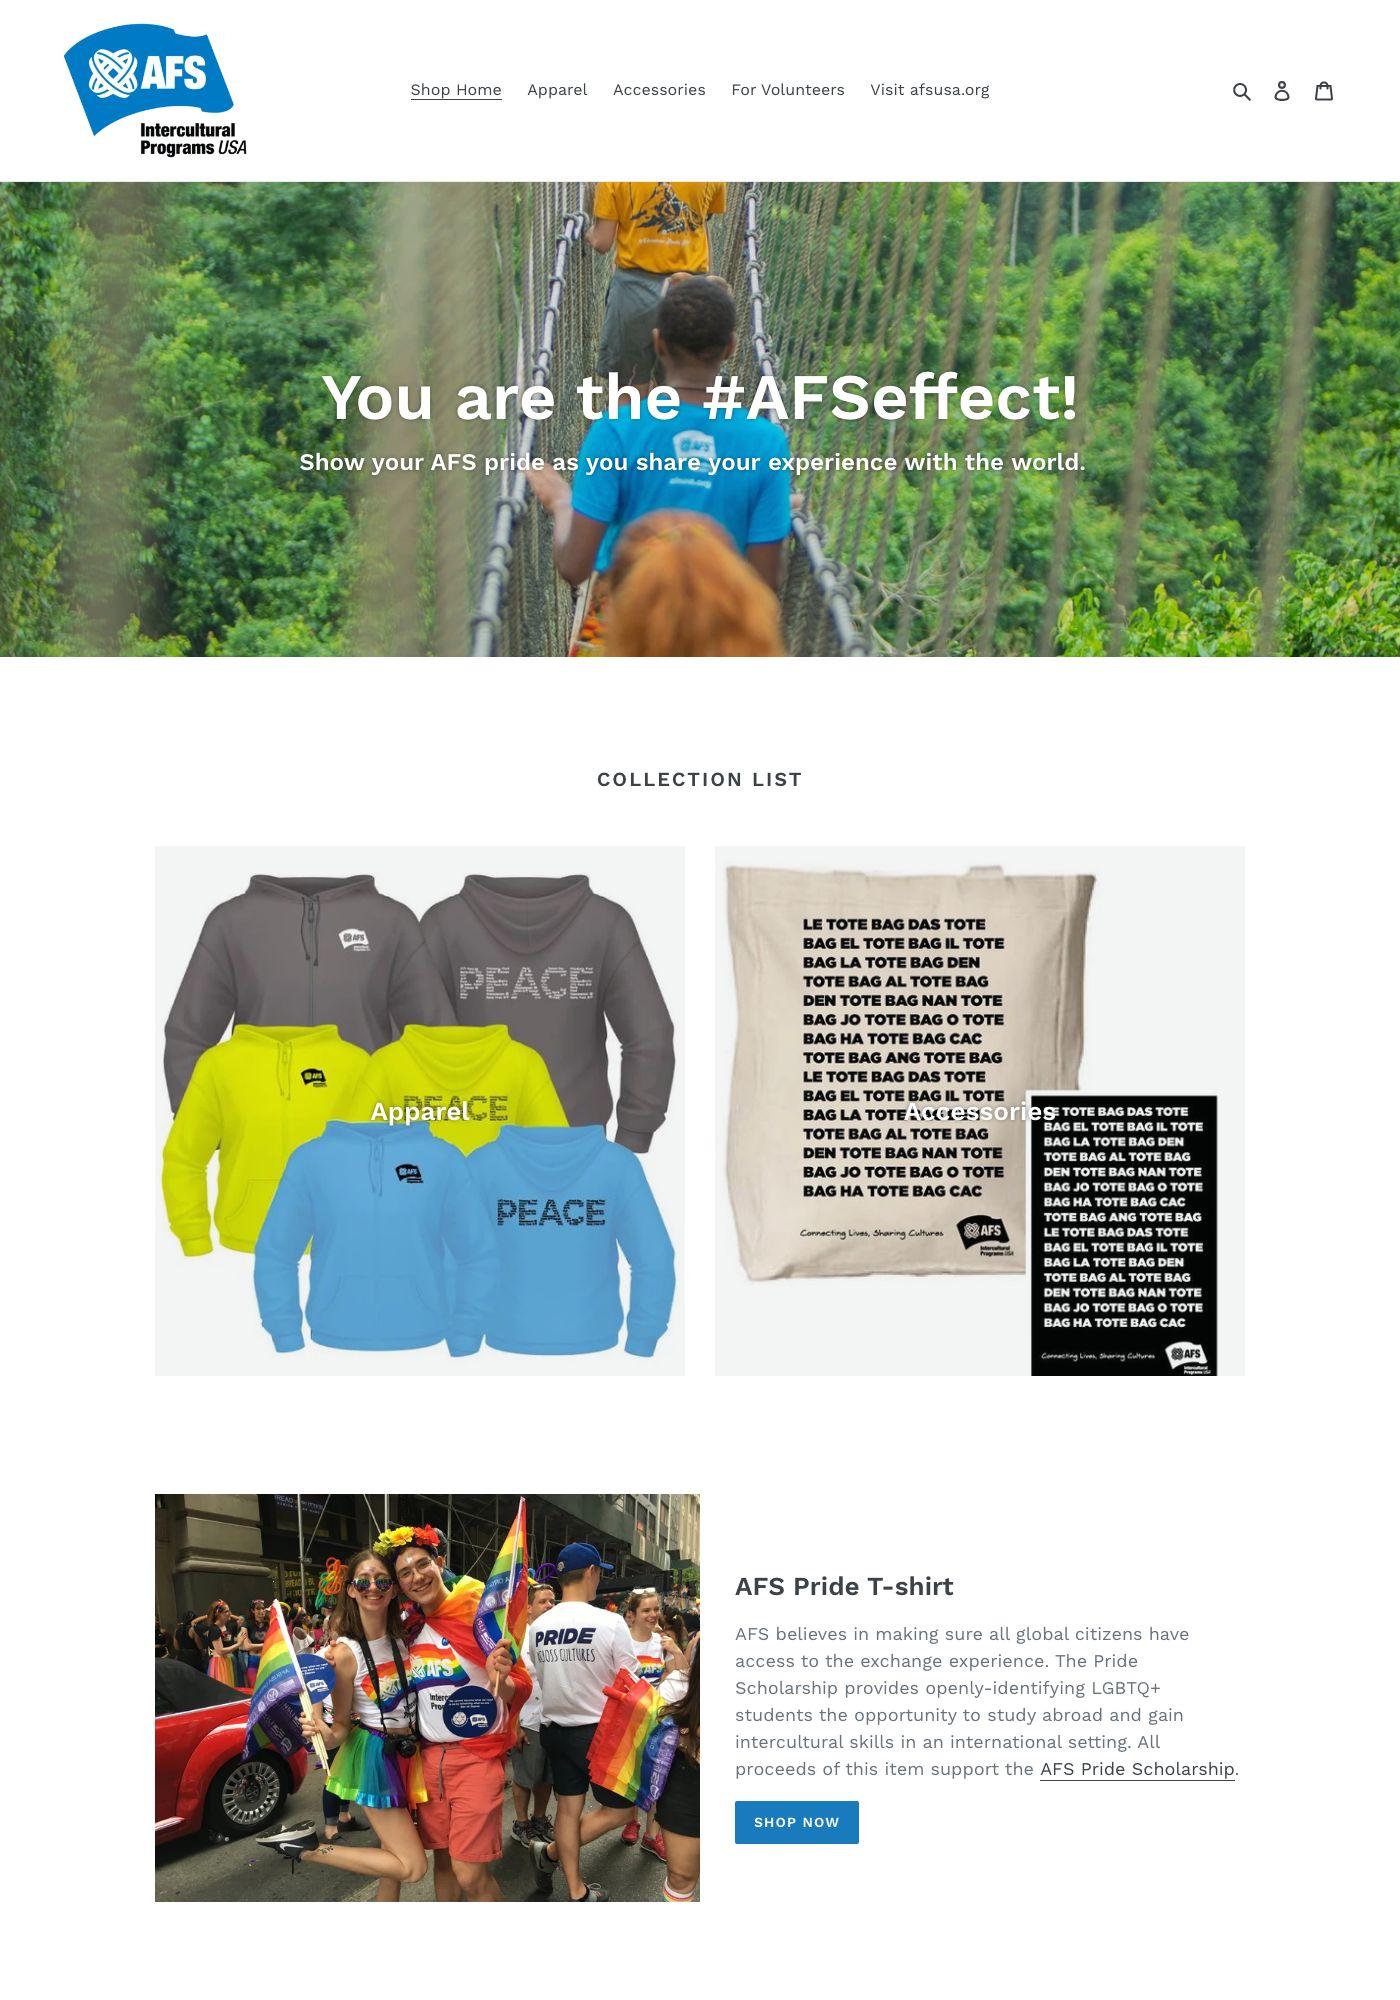 shop.afsusa.org